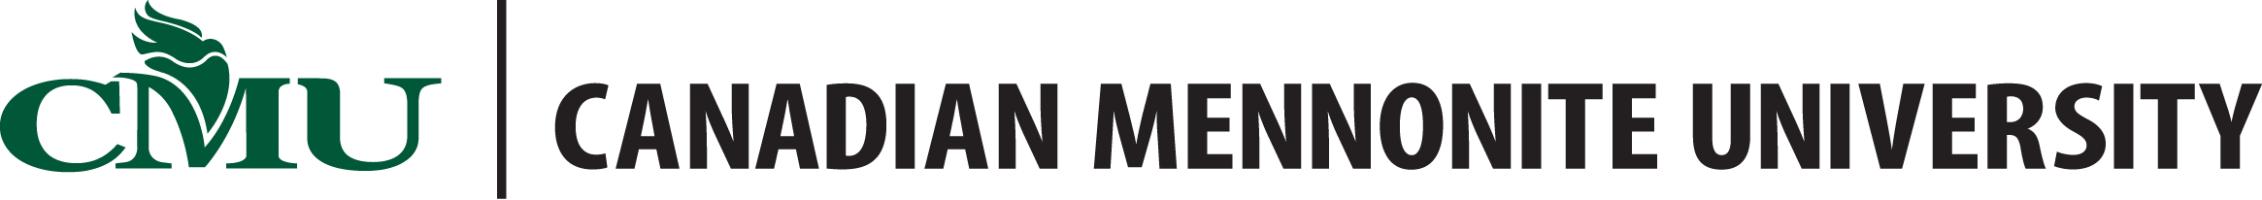 Canadian Mennonite University